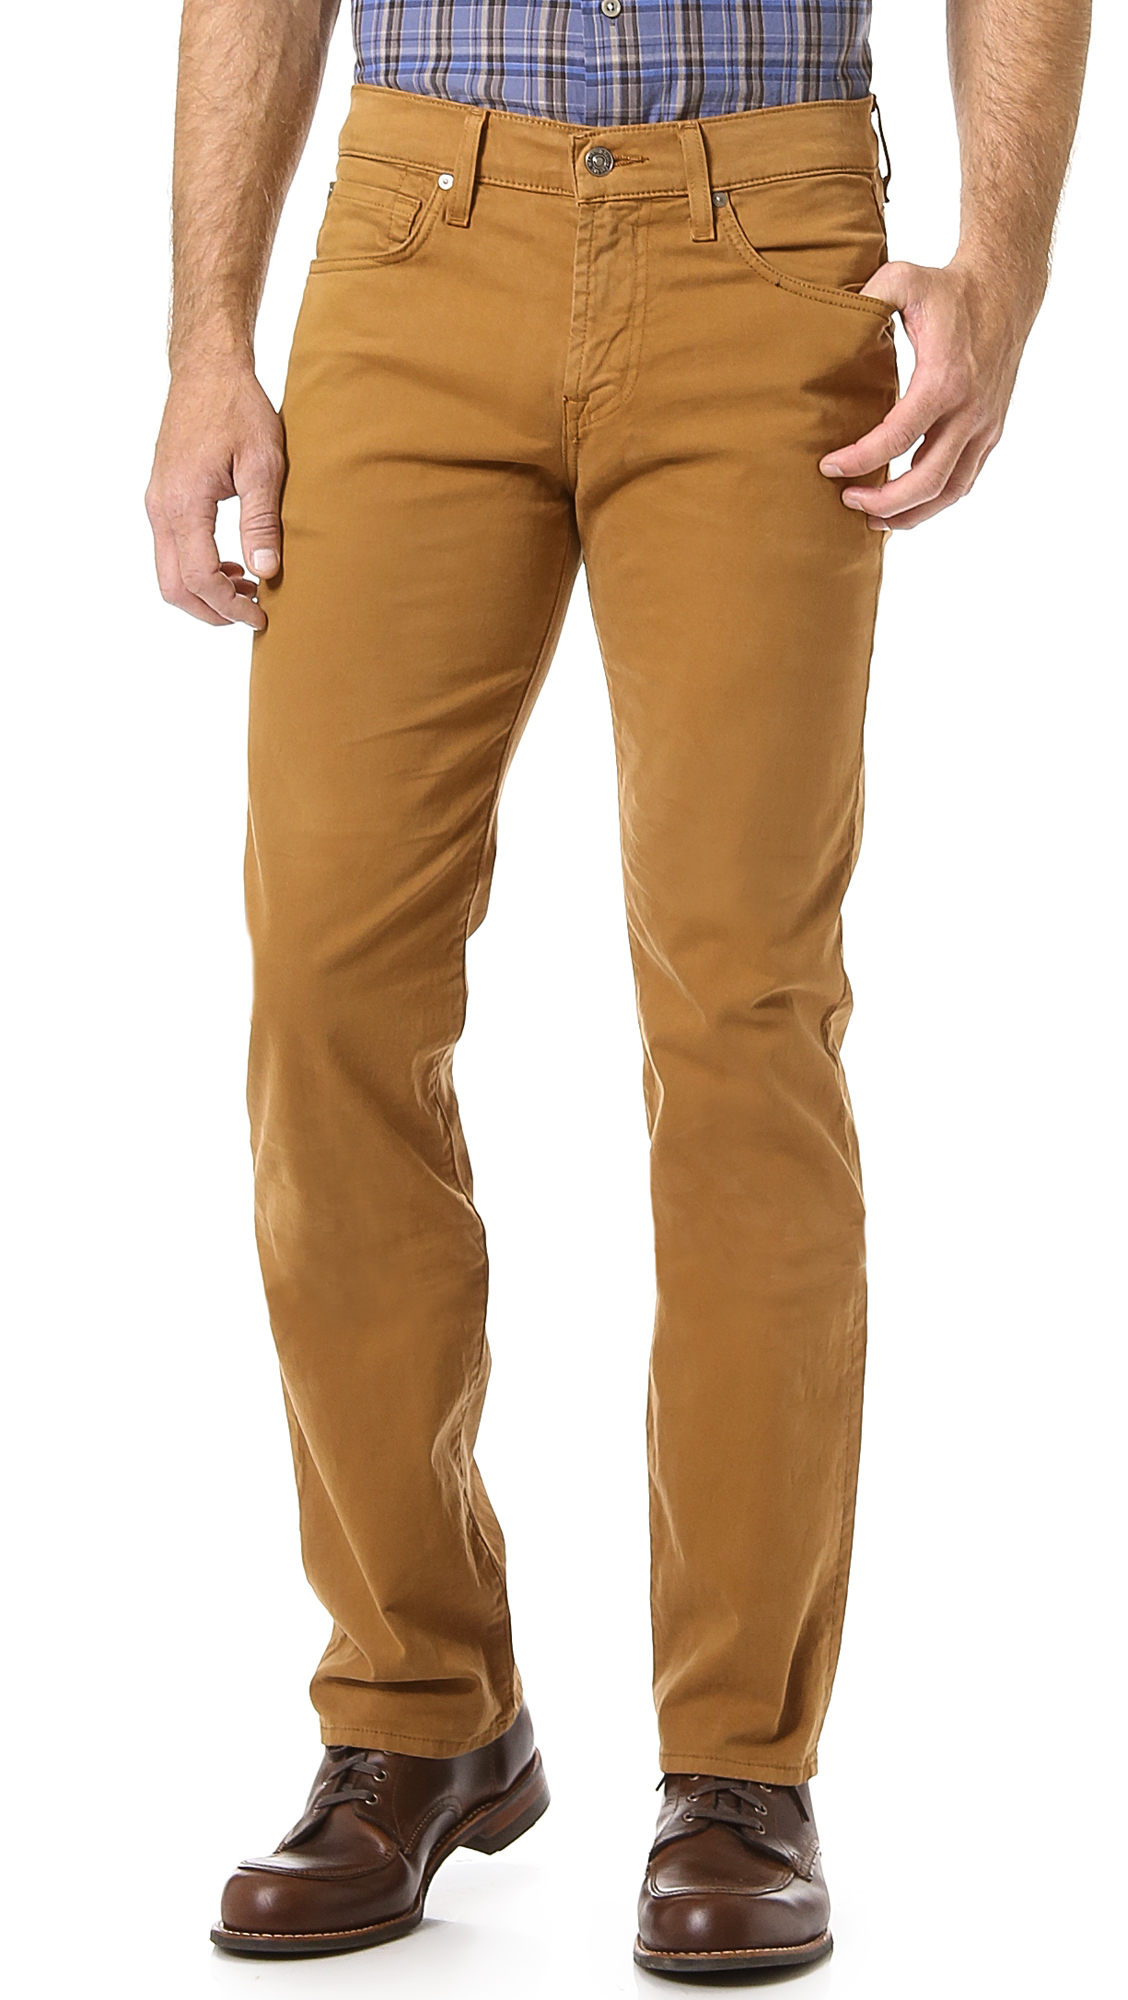 7 For All Mankind Carsen Easy Straight Leg Jeans in Brown for Men